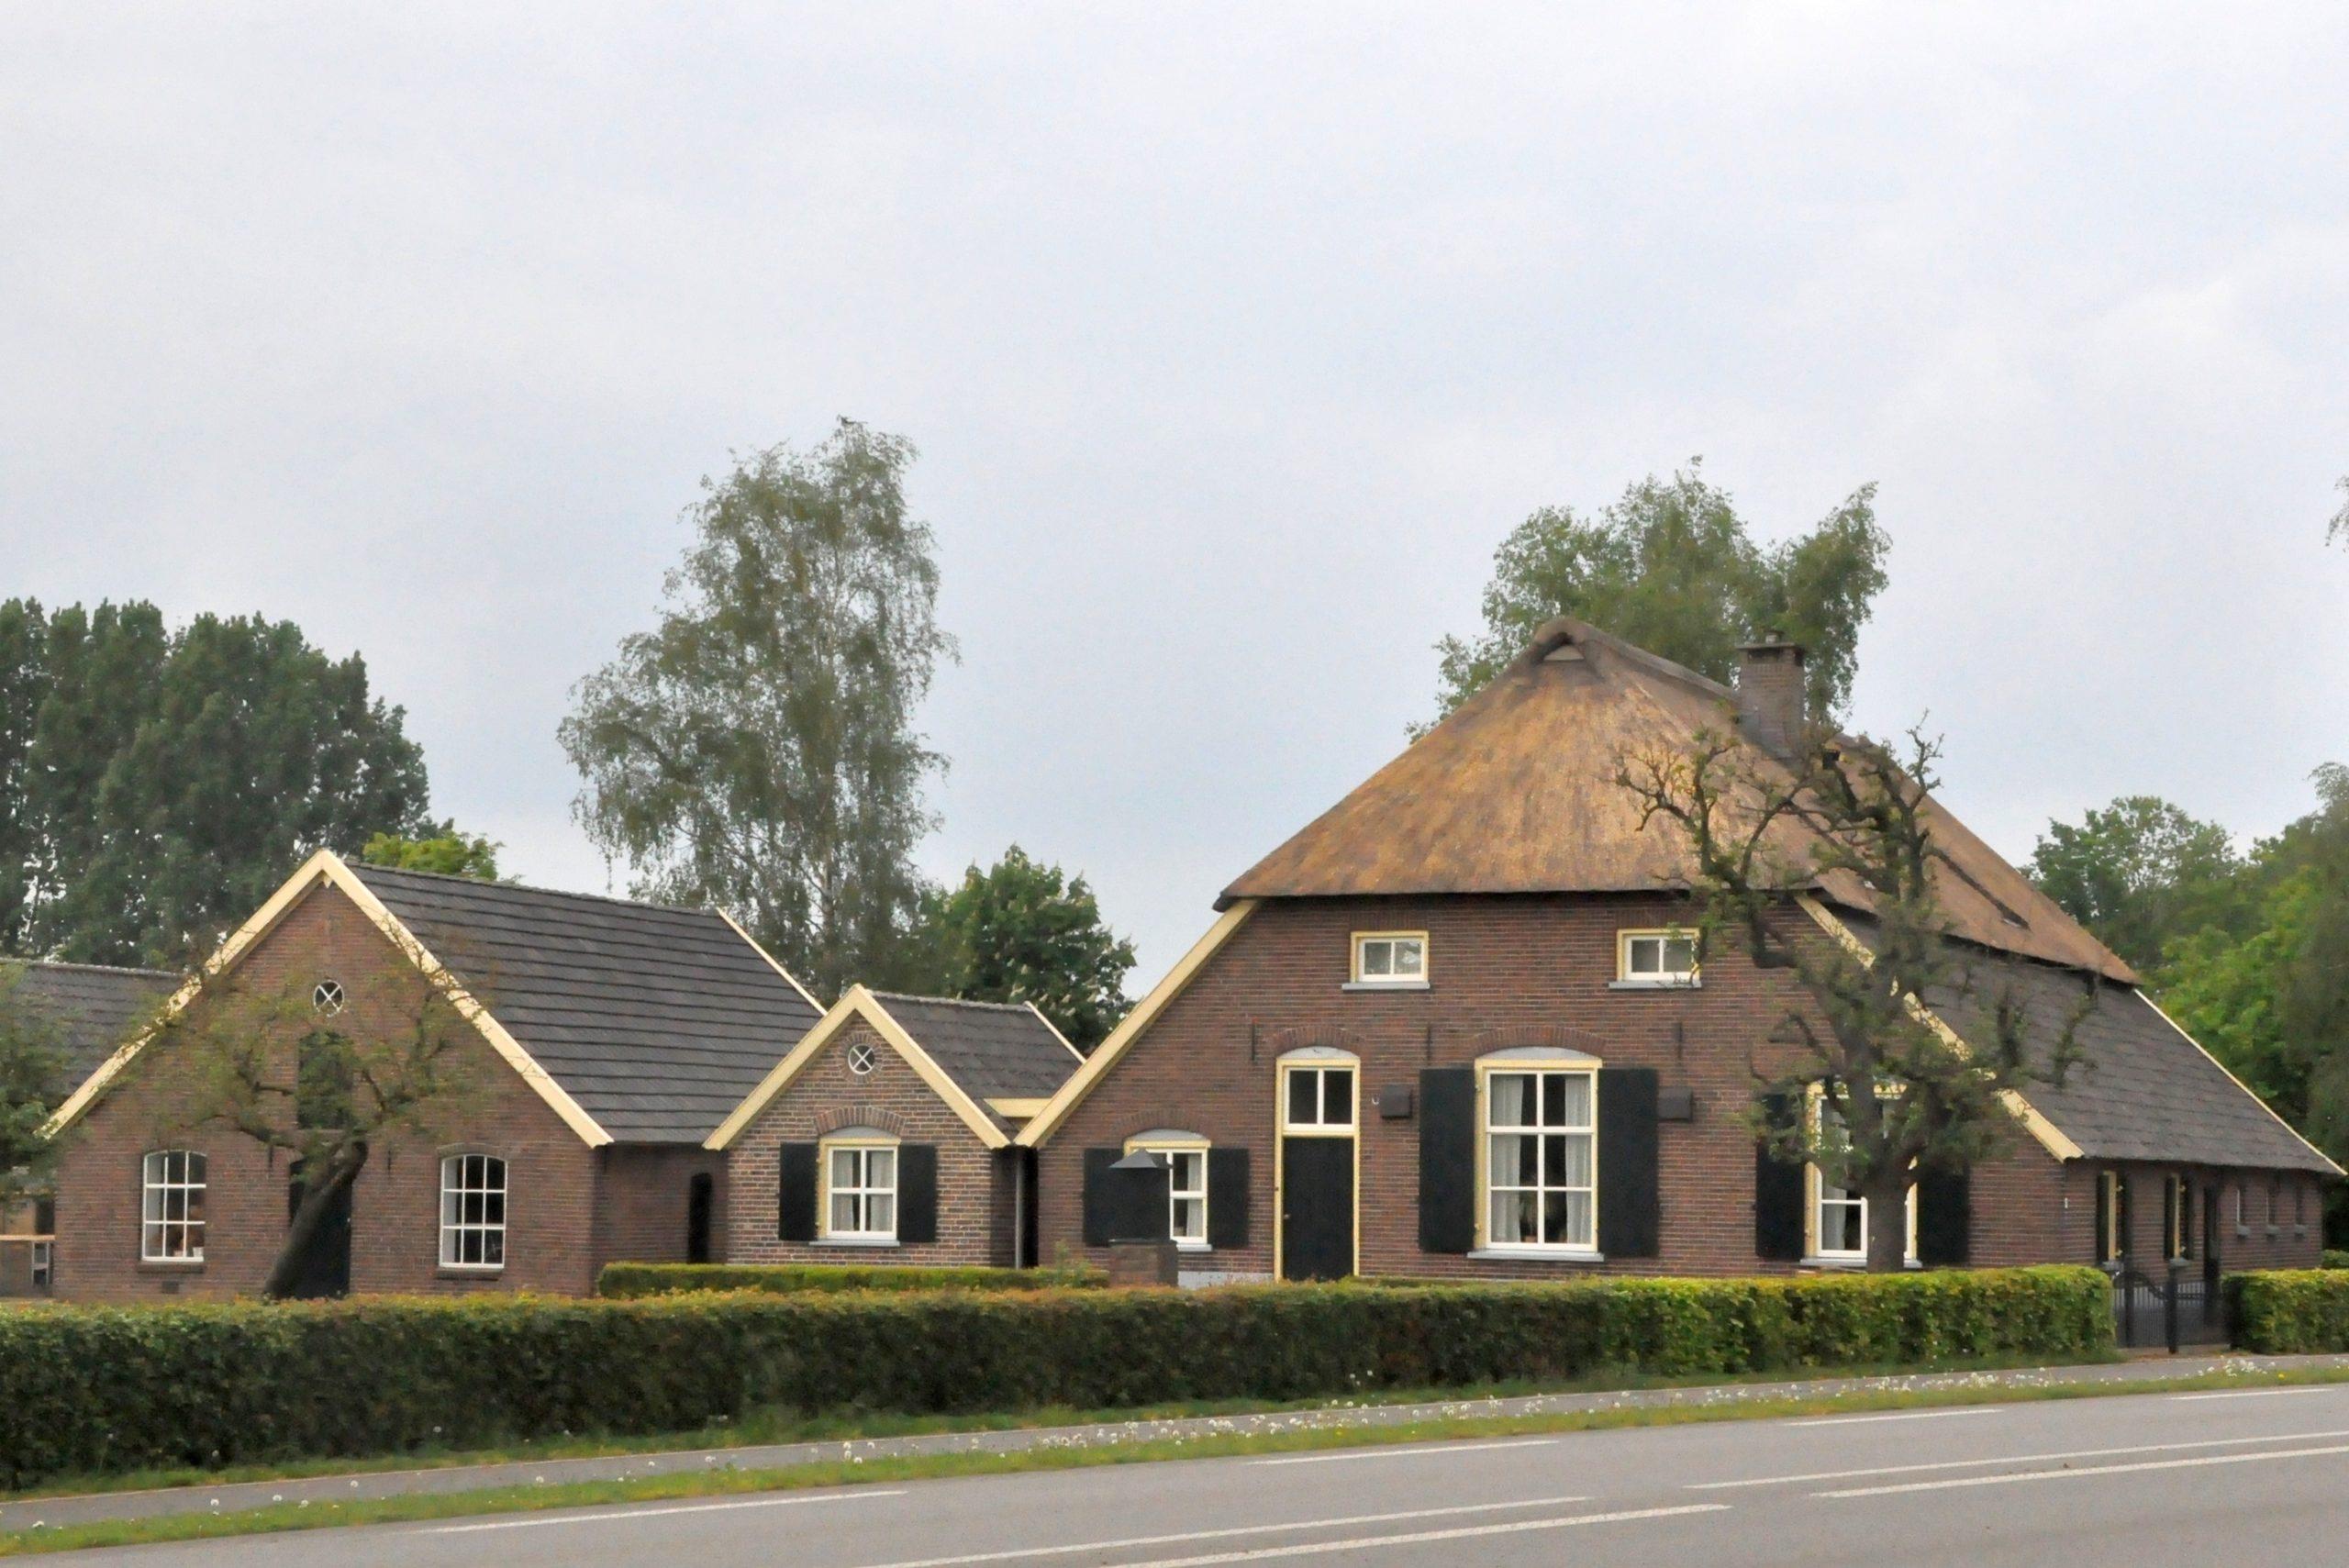 Toldijk Zutphen-Emmerikseweg 73 Boerderij